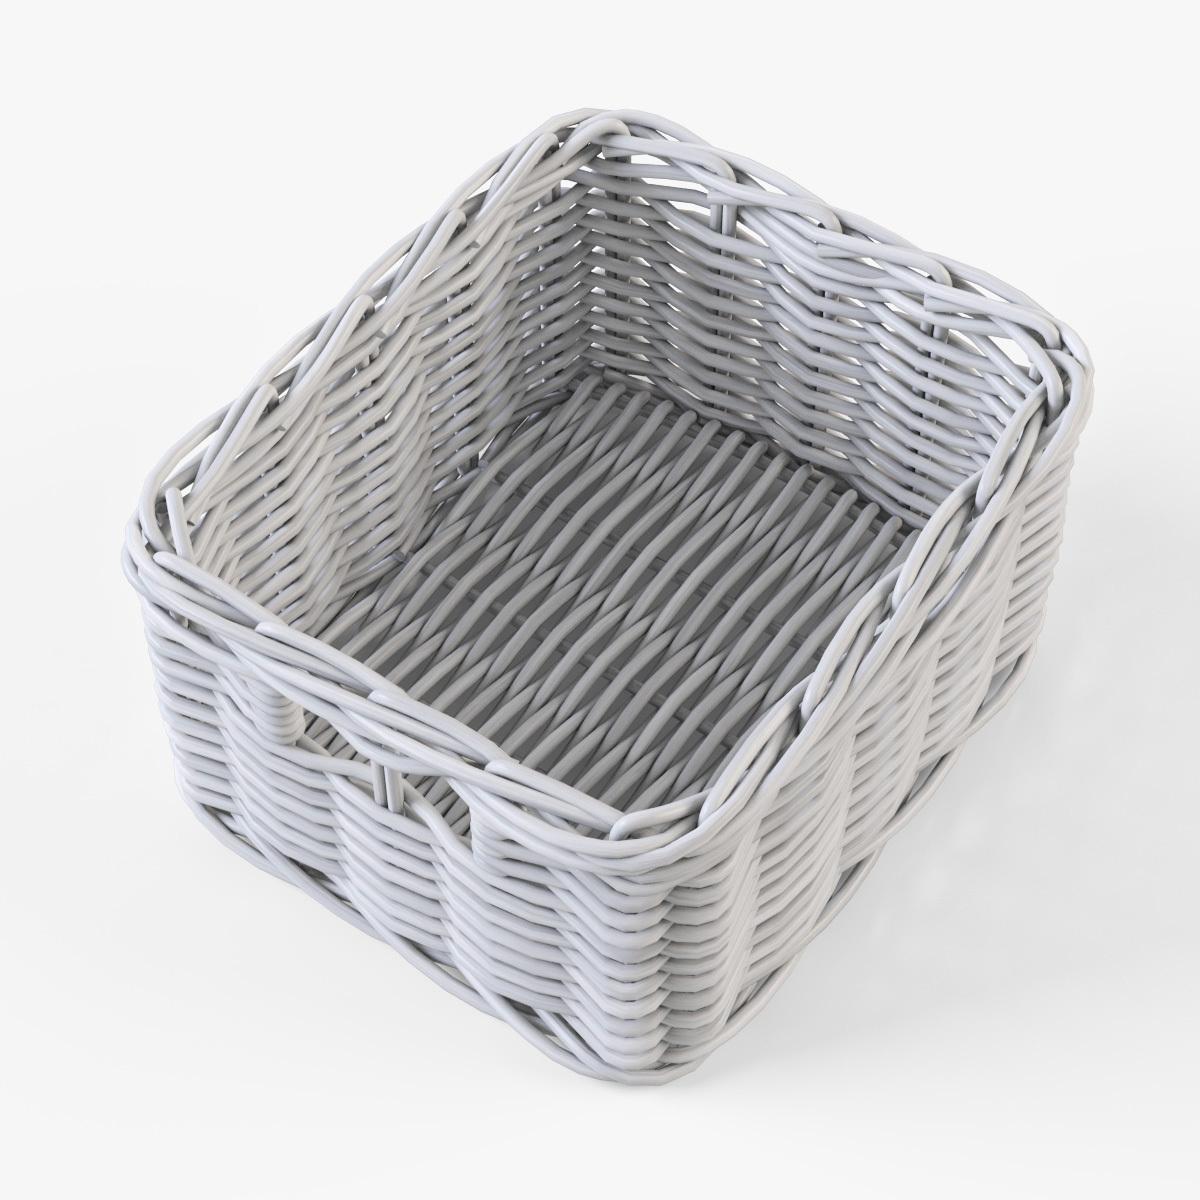 Marvelous 01(Ikea_Byholma1(white)) ...